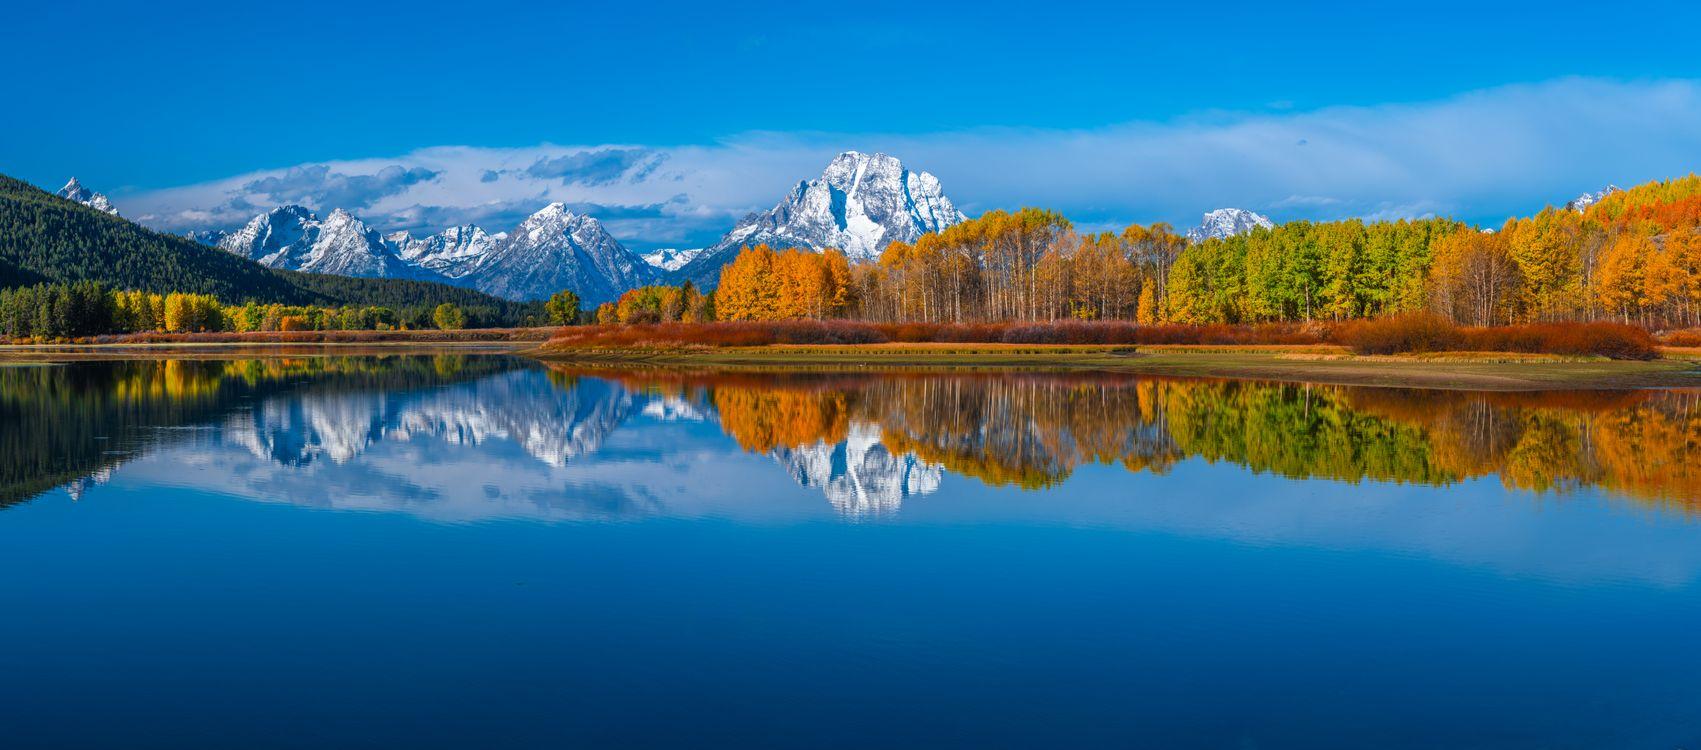 Фото природа США панорама - бесплатные картинки на Fonwall